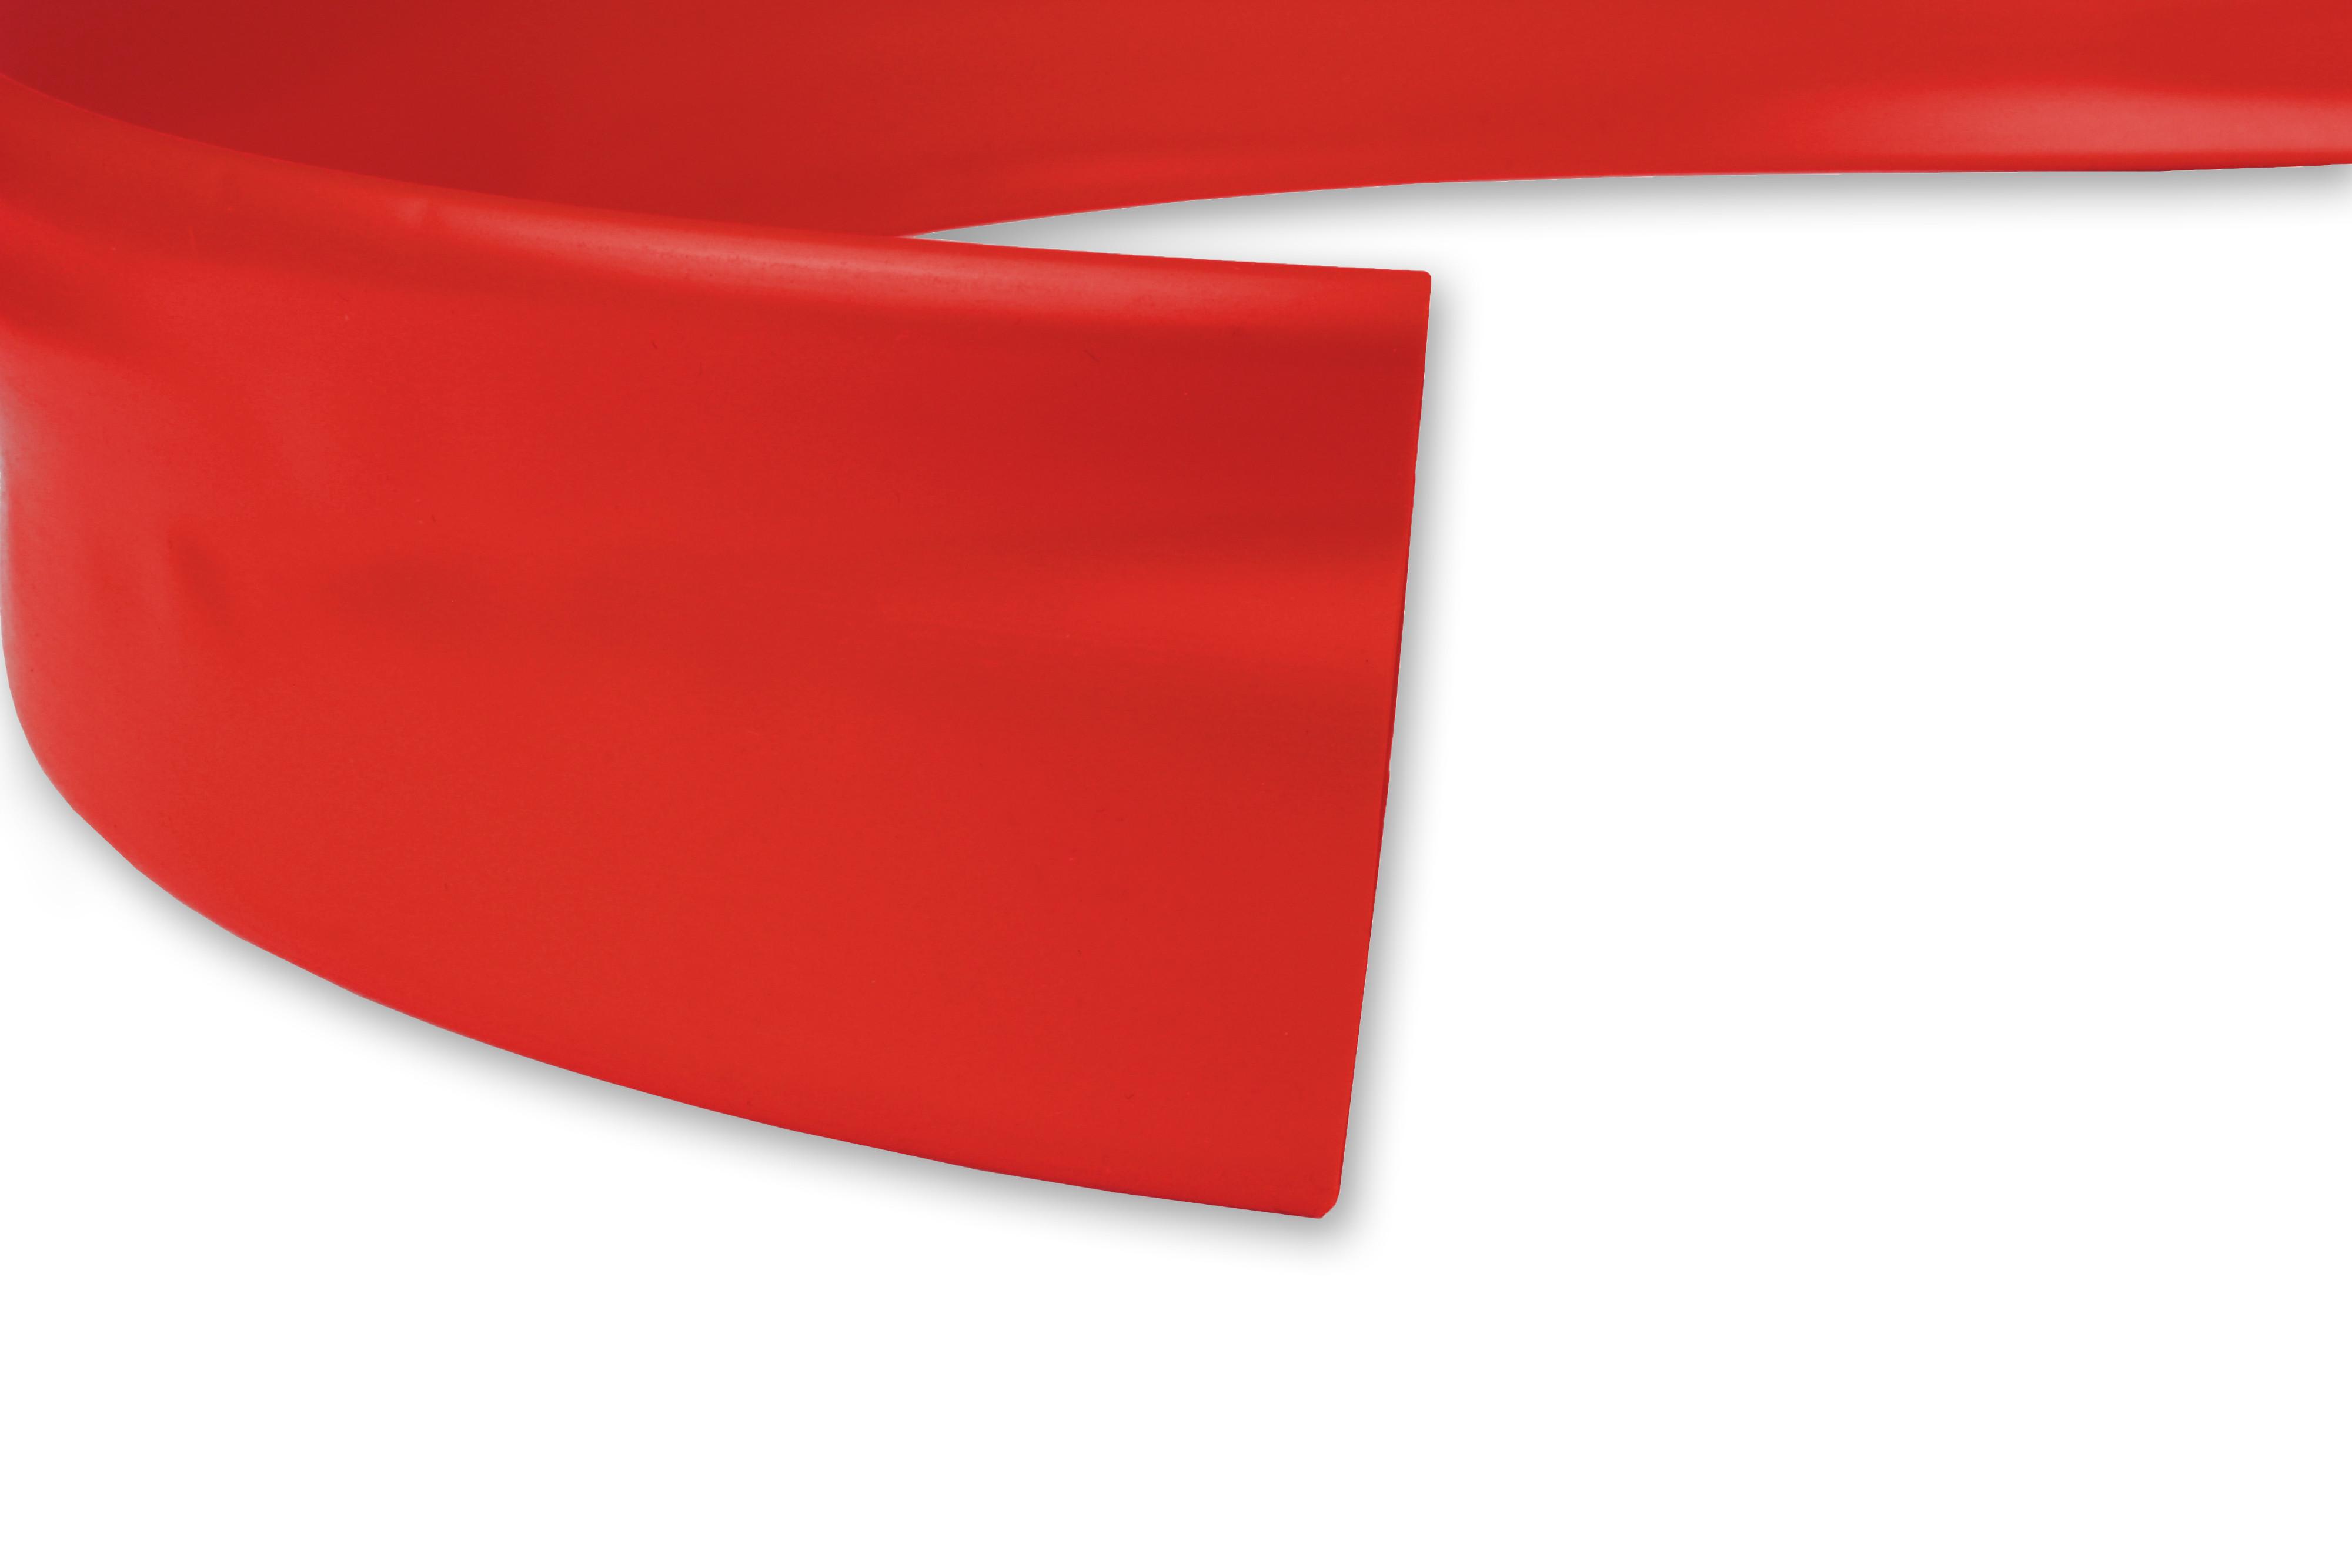 PVC Heat Shrink Tubing HPV Size 38.1mm I.D / 19.0mm I.D Red